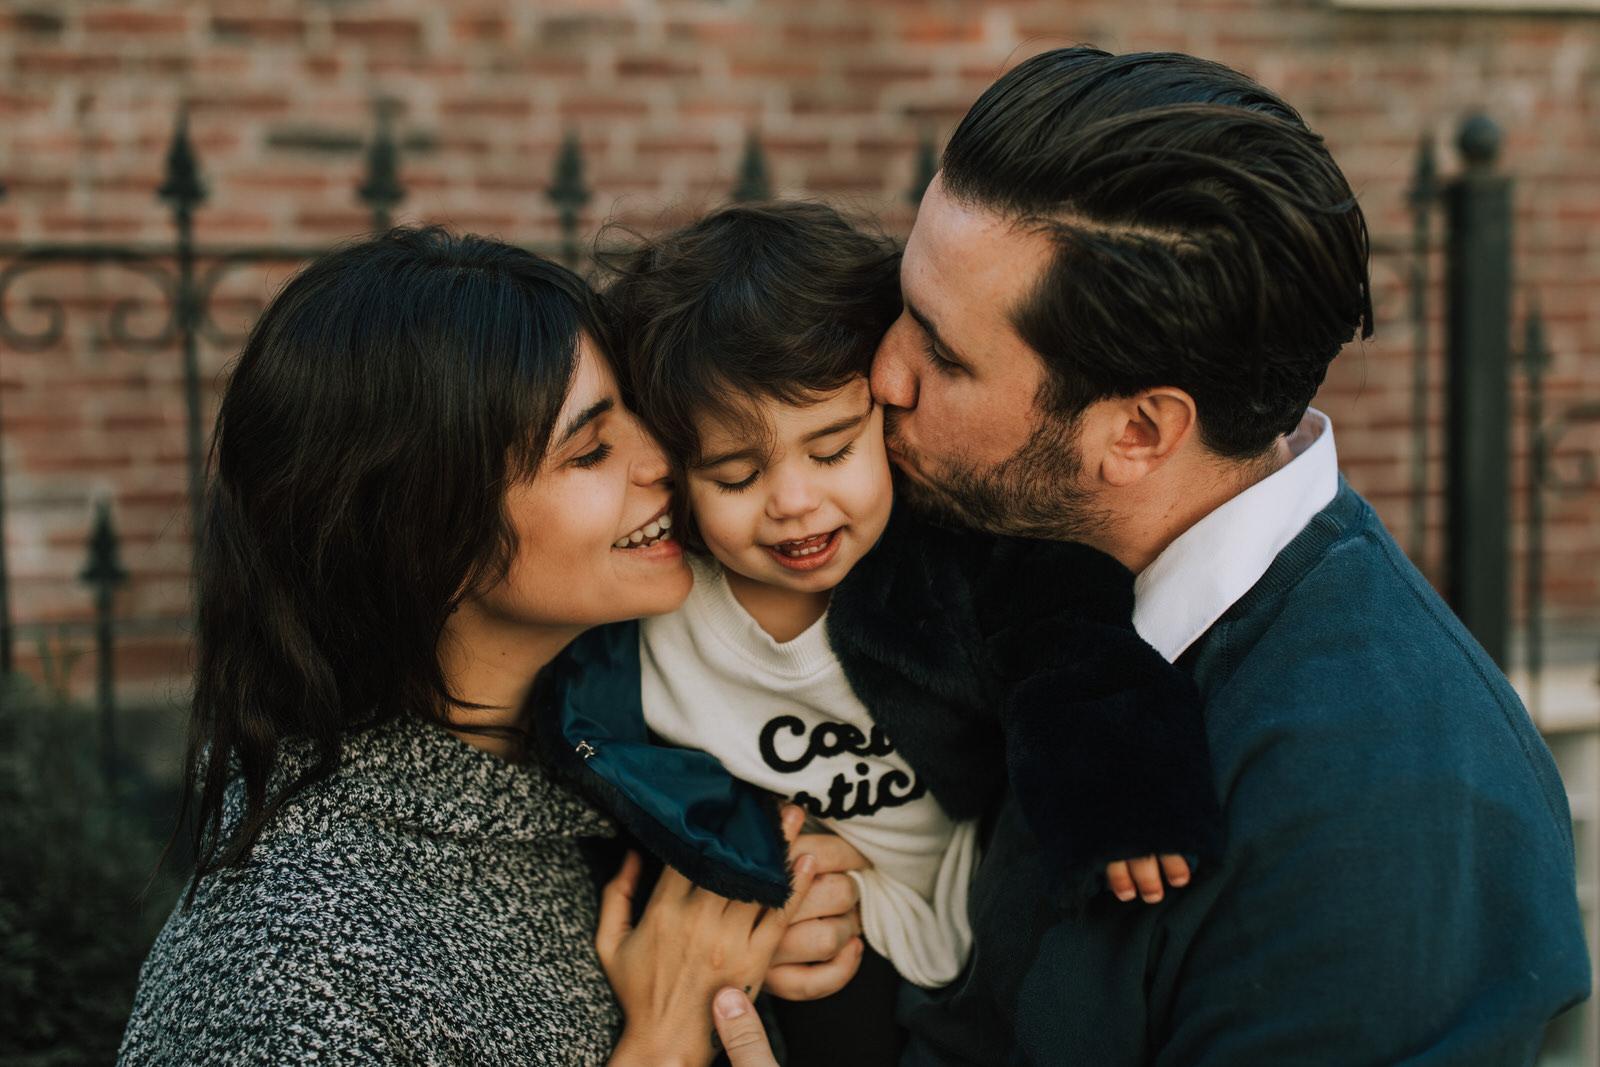 family-session-the-jupps-vancouver-photographer-iamjohnyoo-23.JPG